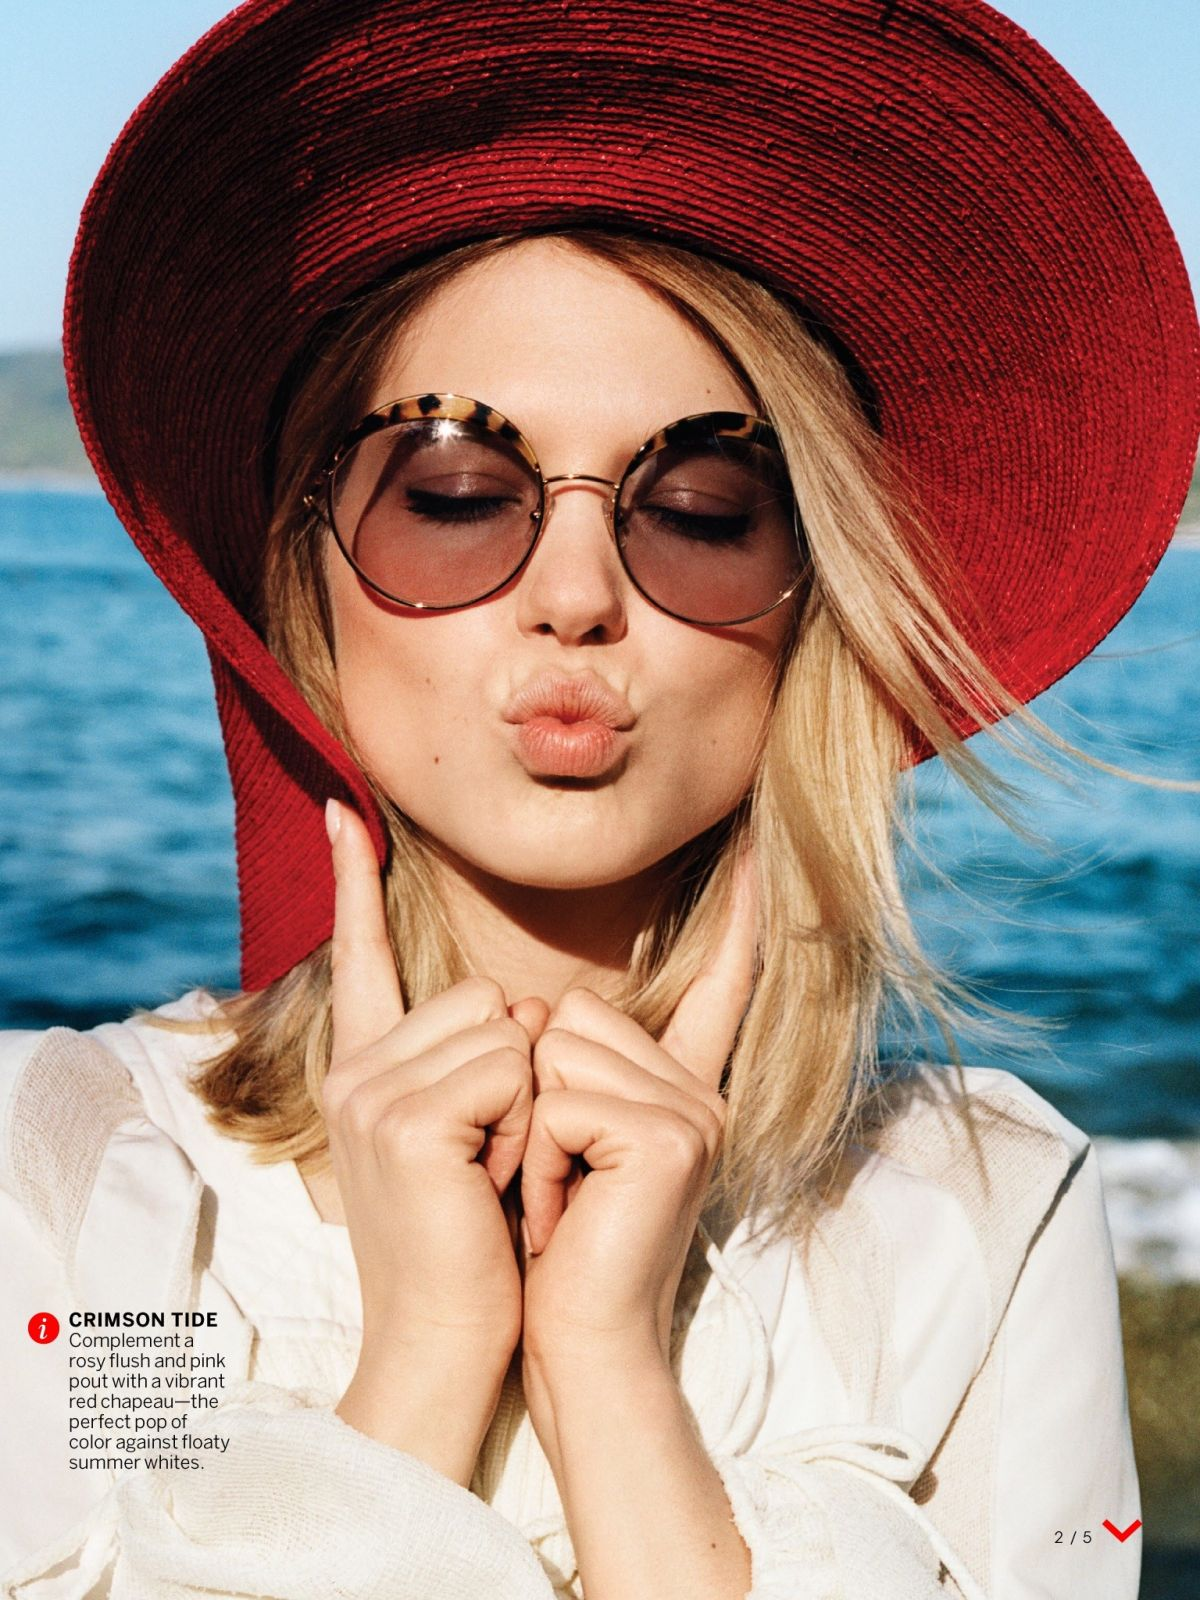 LEA SEYDOUX in Vogue Magazine, June 2015 Issue